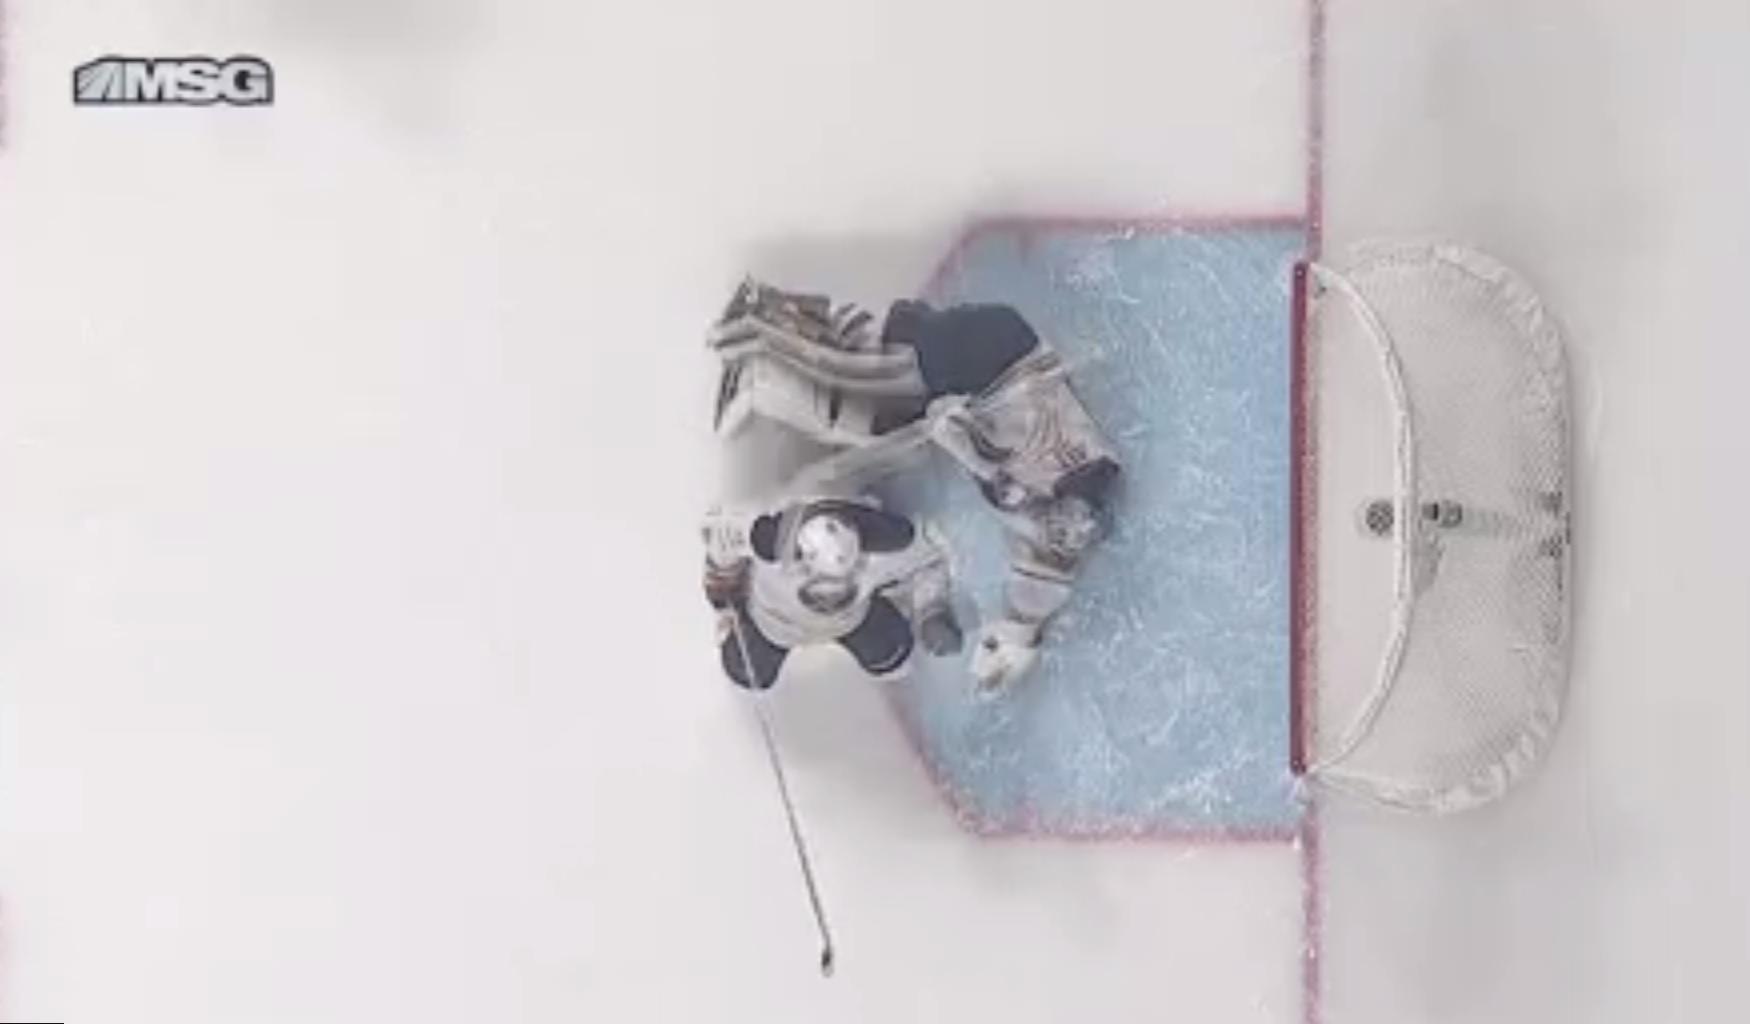 Video: Sabres 3, Canadiens 2 (OT)